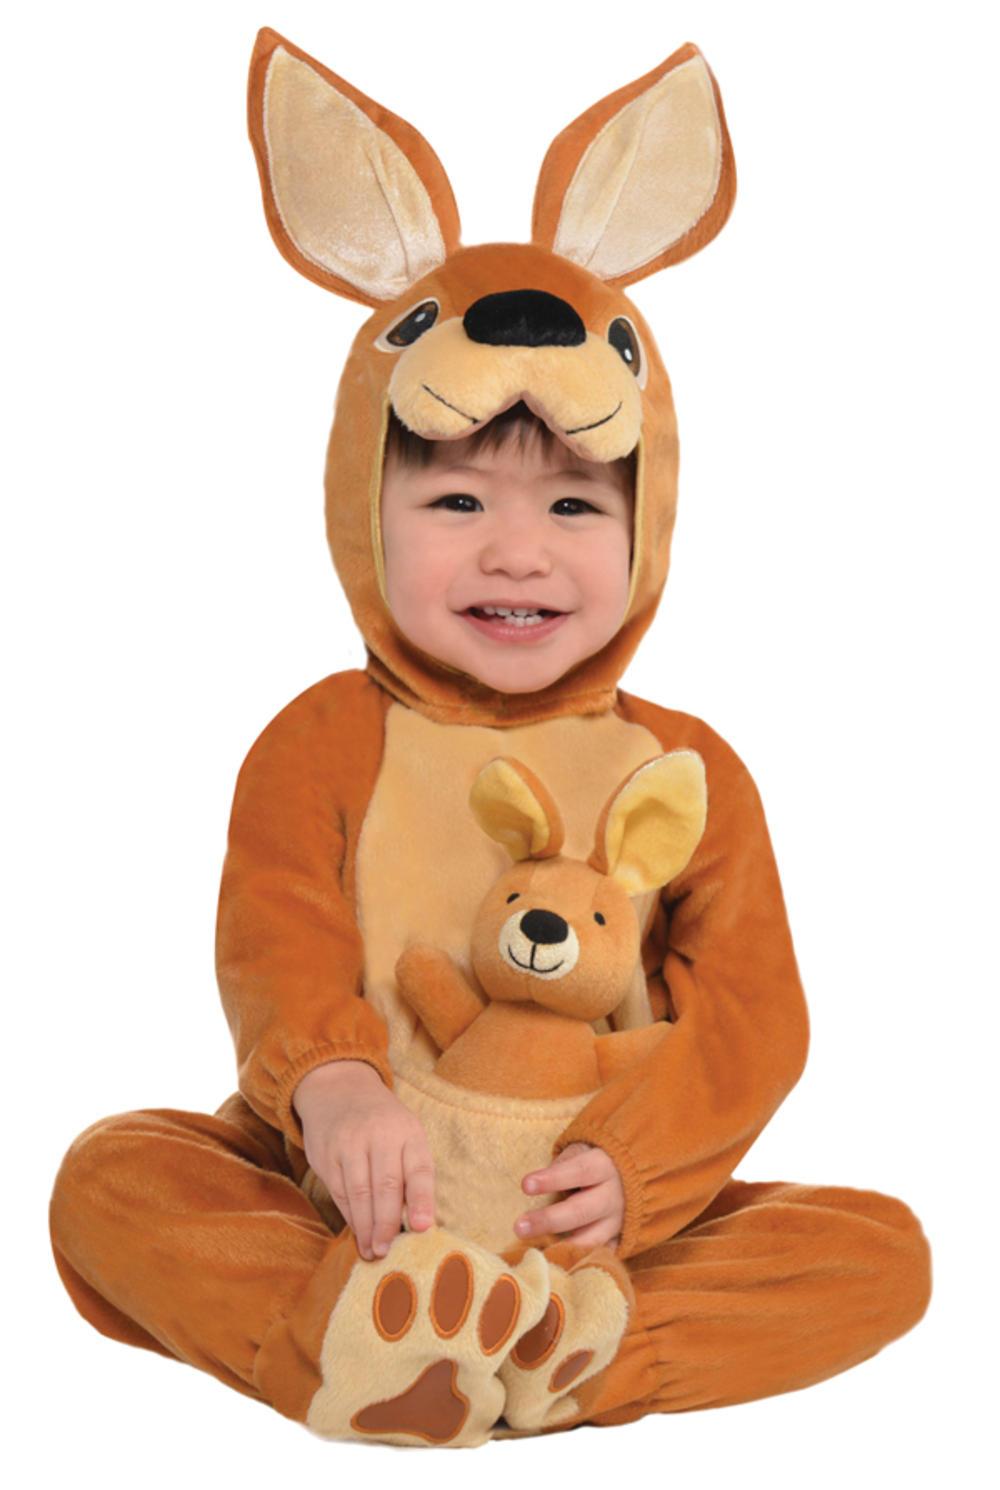 Kangaroo Baby Boys Fancy Dress Animal Zoo Safari Toddler Infants Costume Outfit